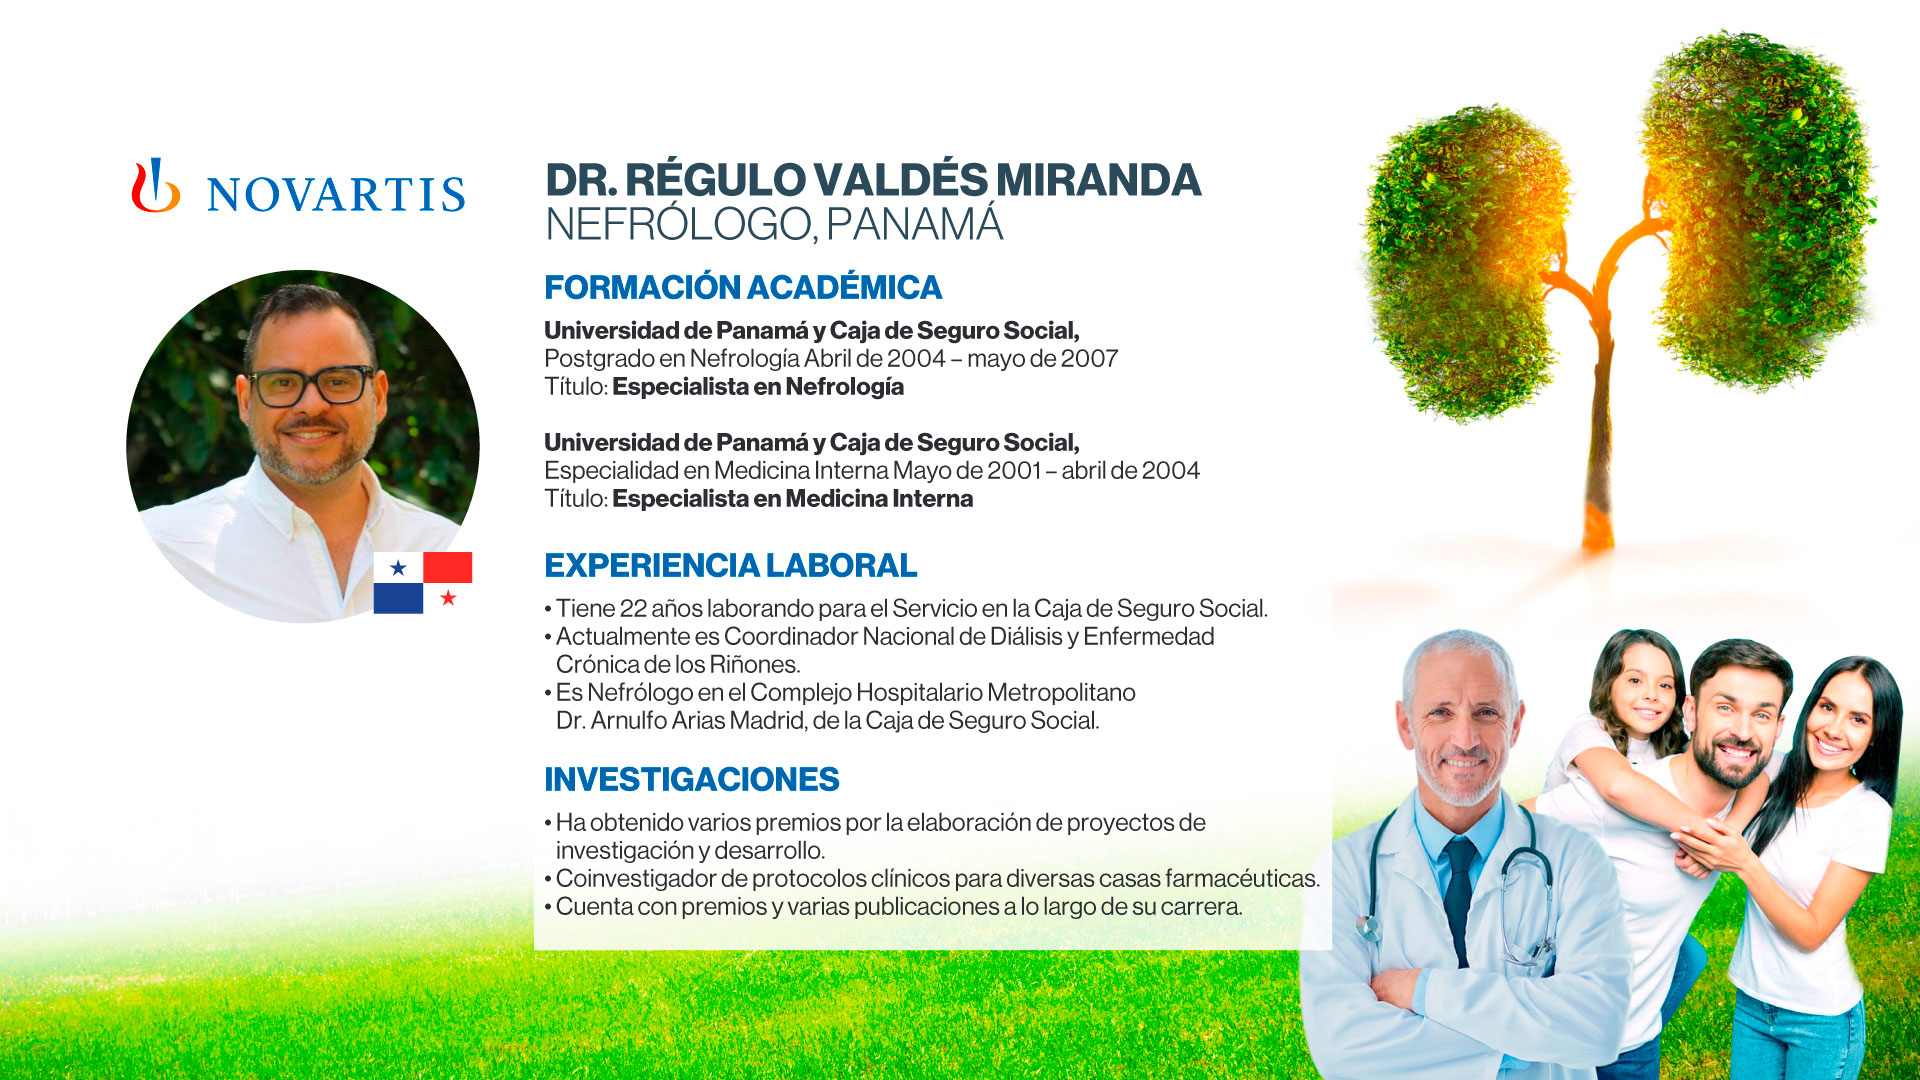 Dr. Régulo Valdés Miranda